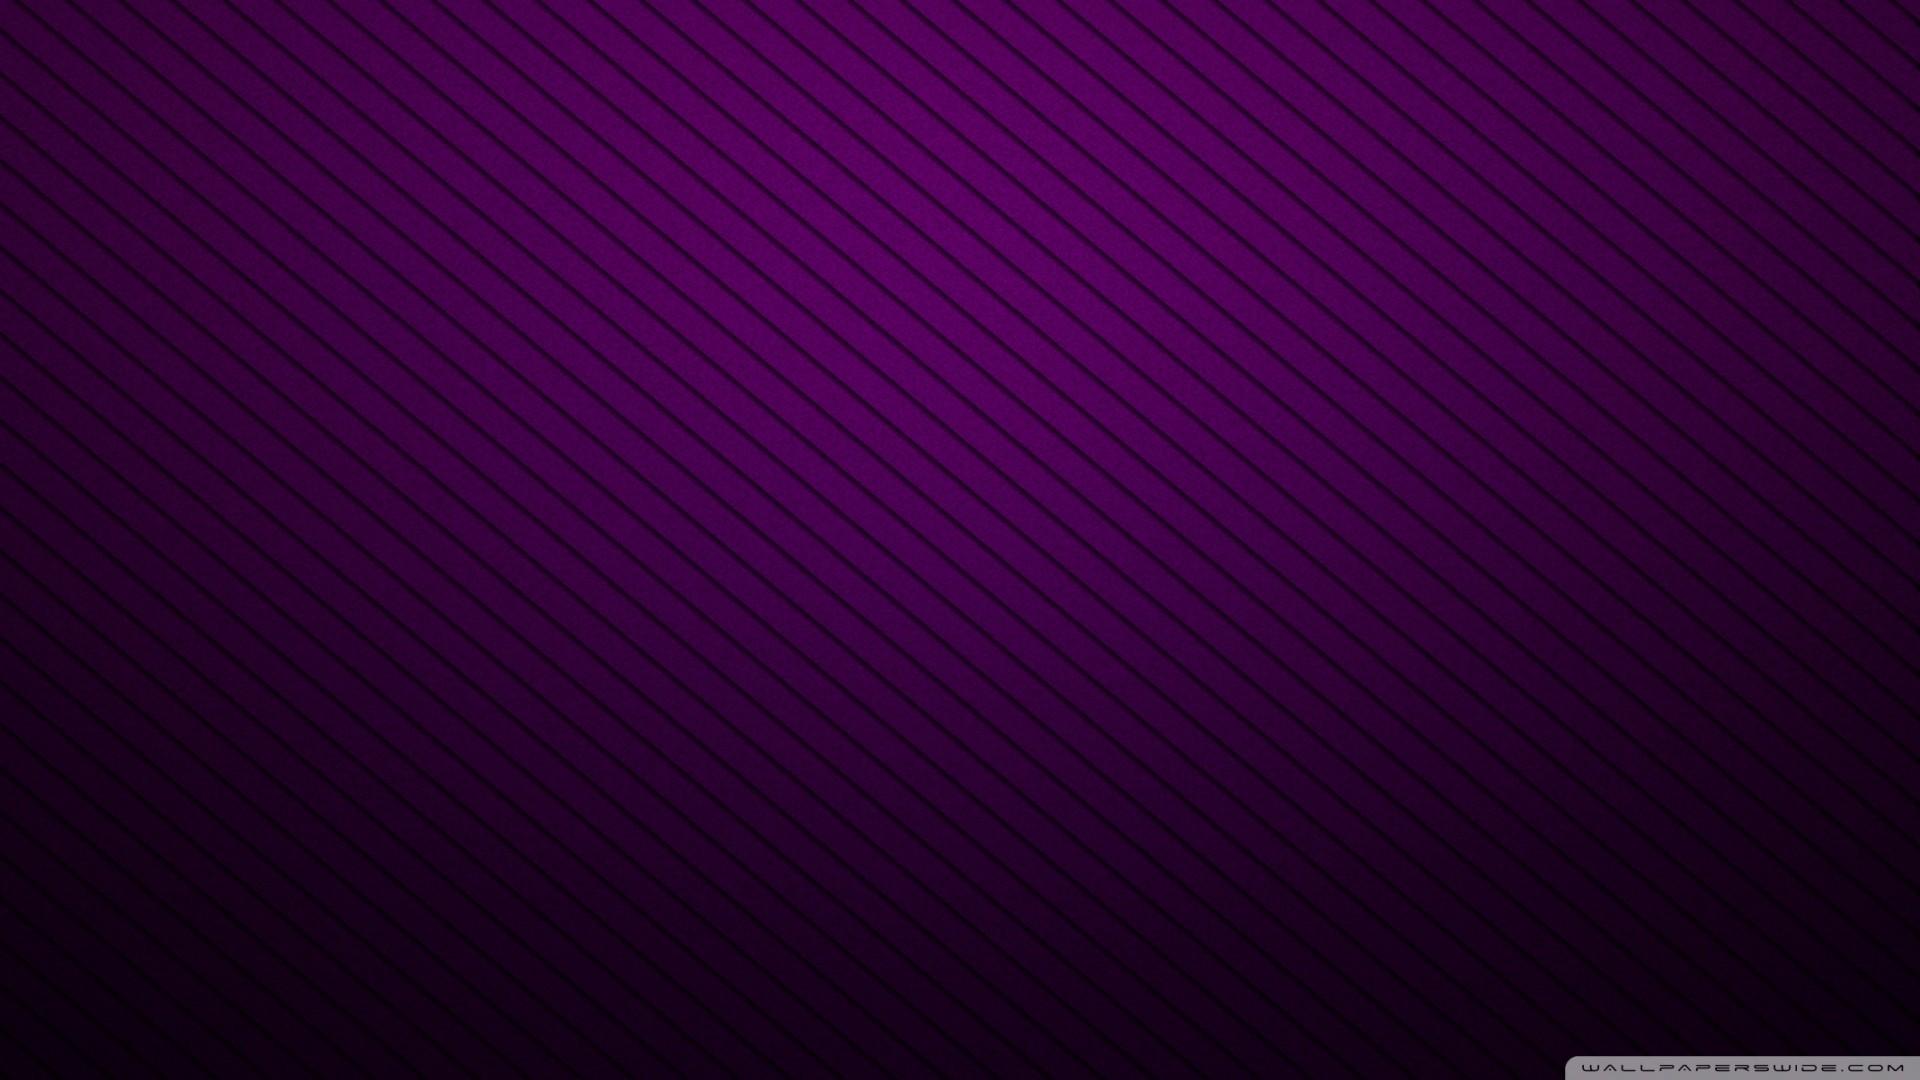 Dark Purple Color Wallpaper Purple, wallpaper, lines #9532